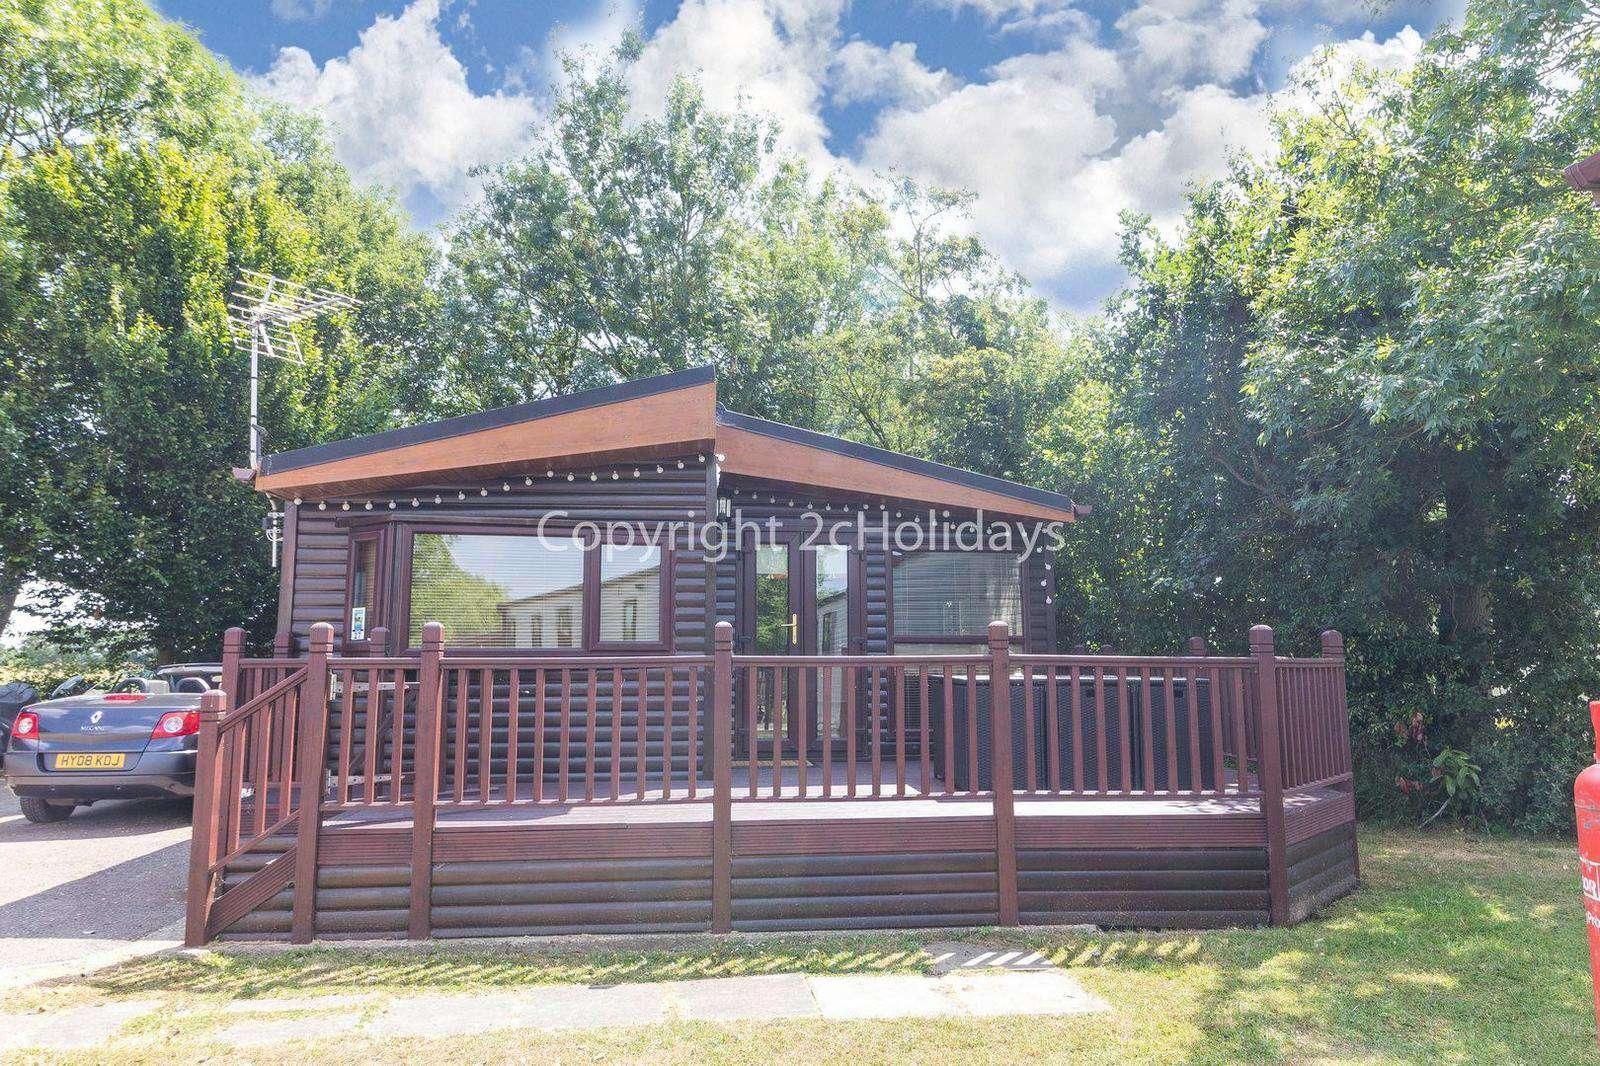 Decked accommodation at Carlton Meres Holiday Park